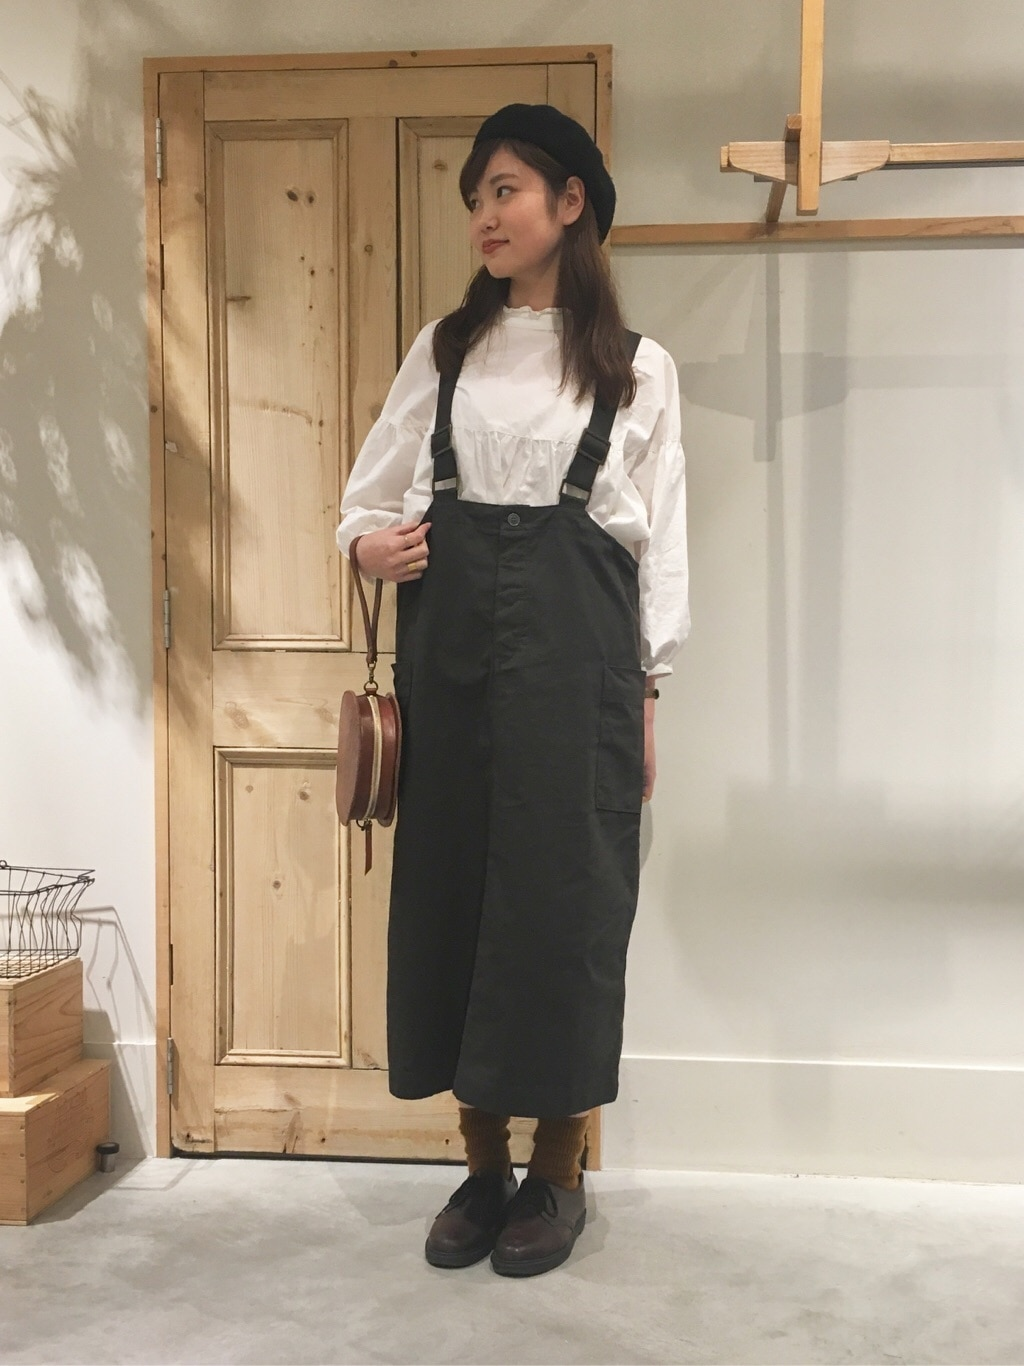 Malle chambre de charme 調布パルコ 身長:167cm 2019.10.03